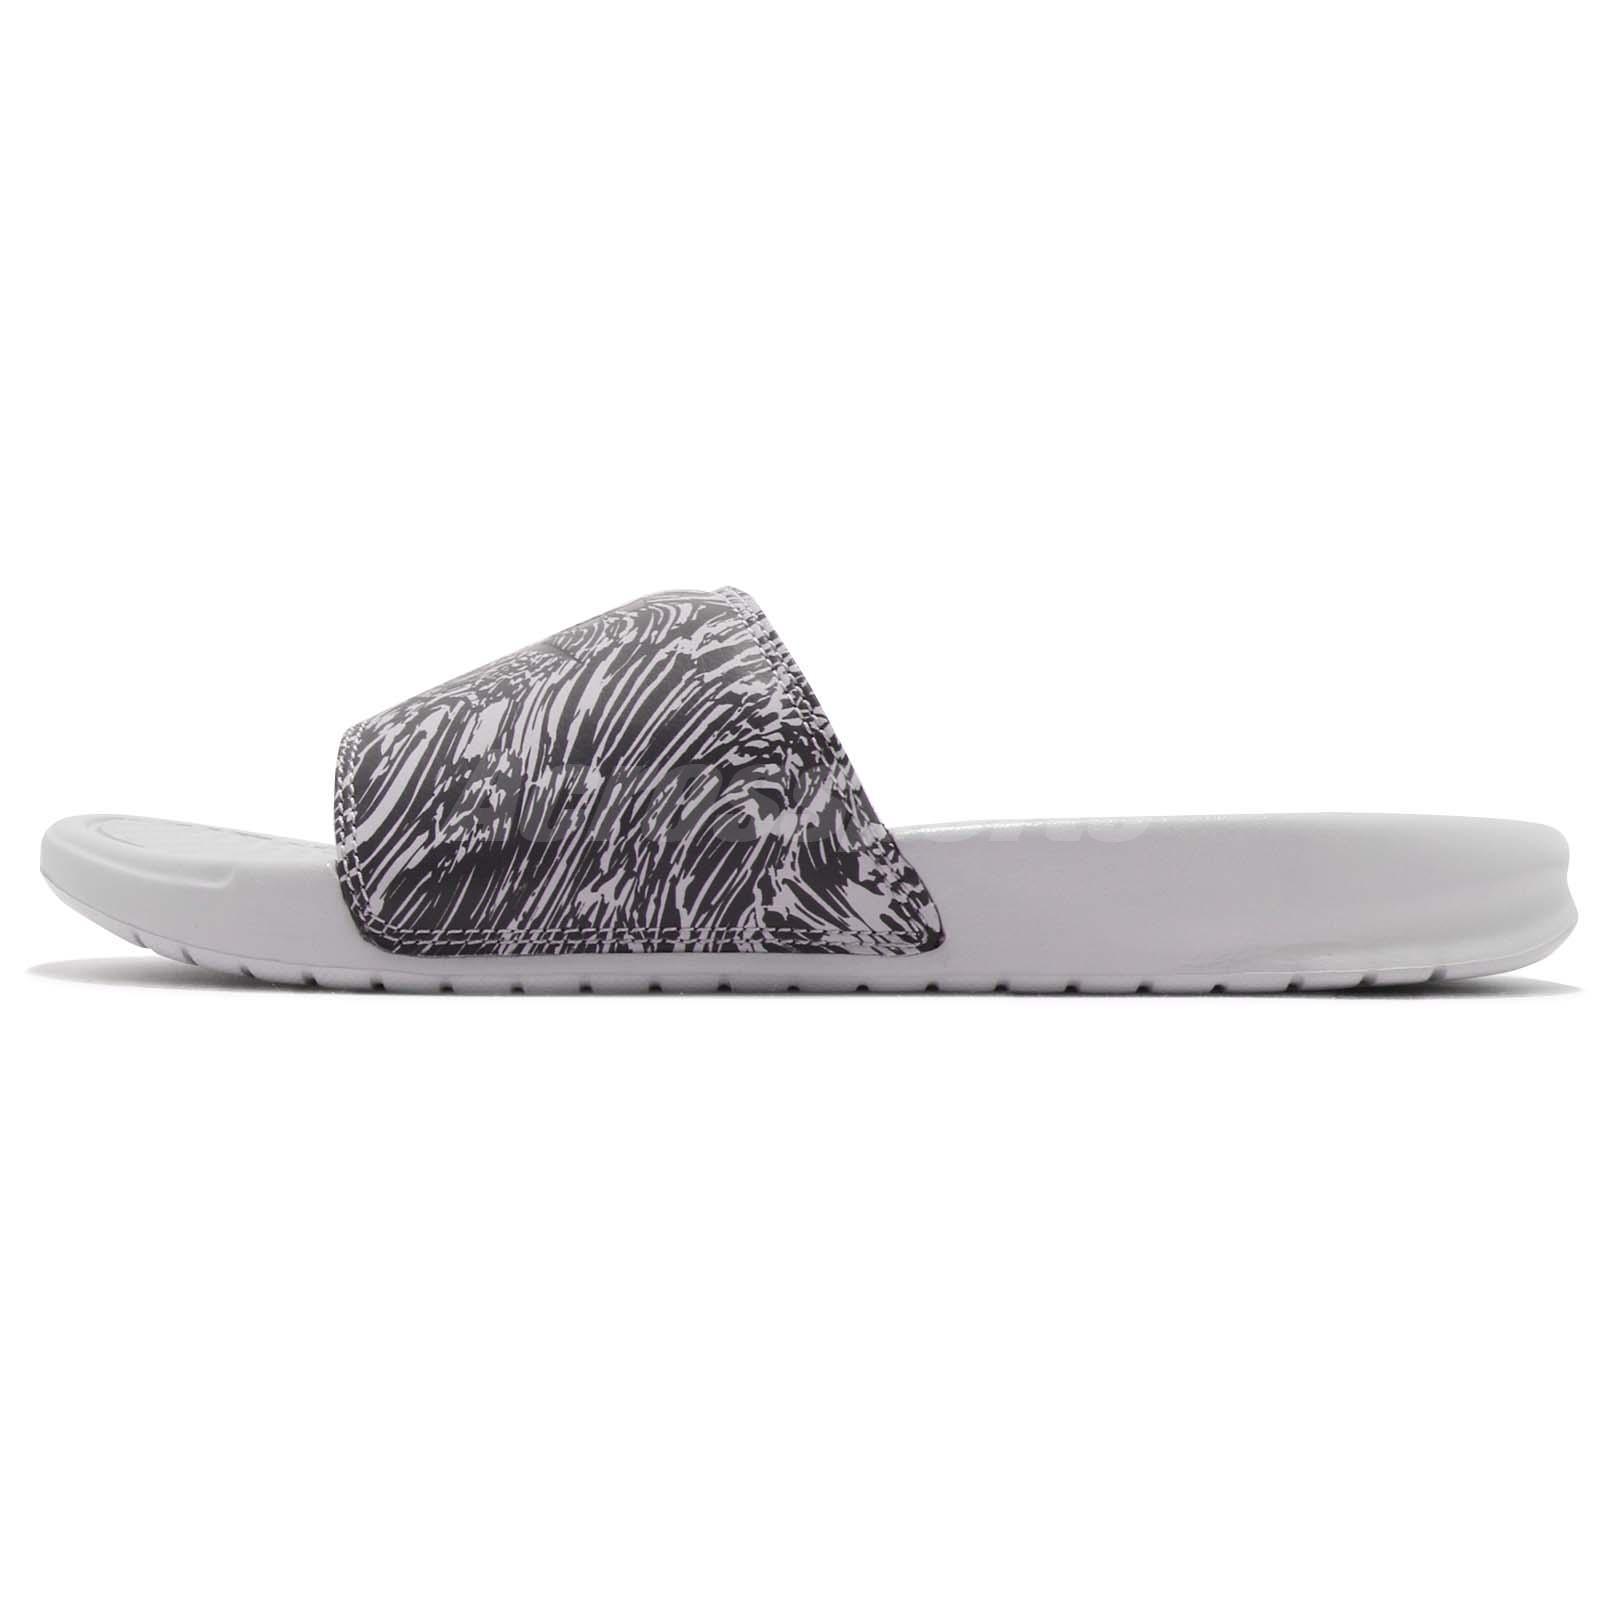 4ccdaa4bc042 Nike Benassi JDI Print Grey Anthracite Men Sports Sandals Slides ...